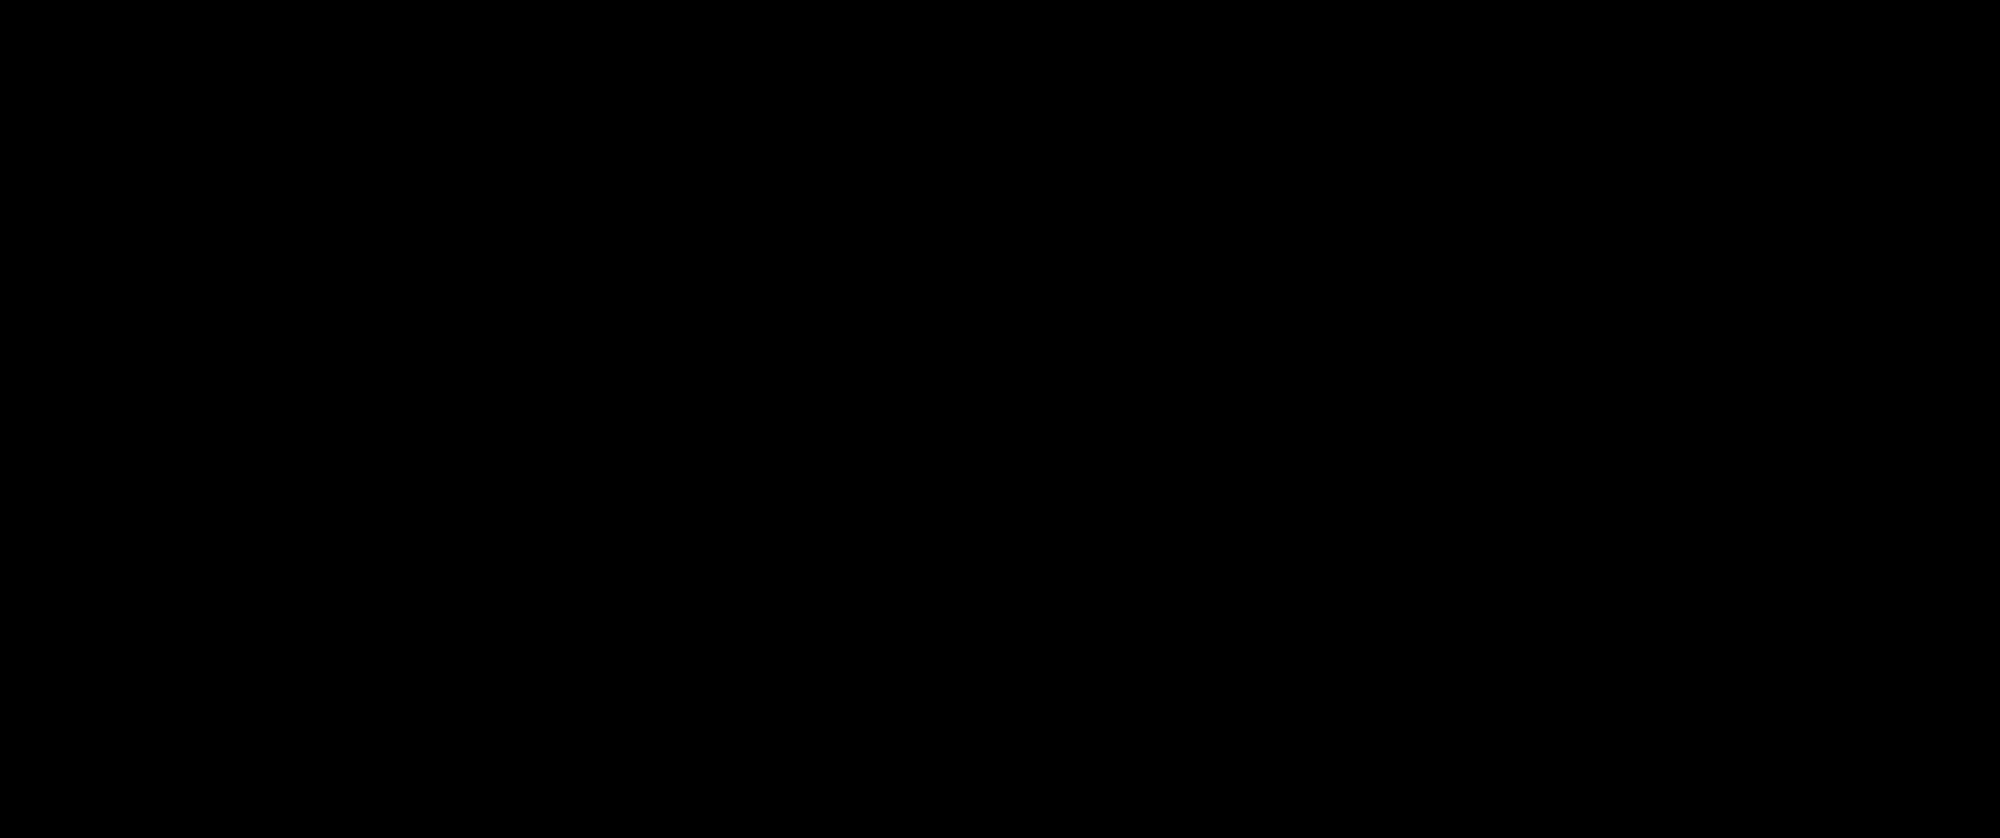 VoiceCatcher-logo.png